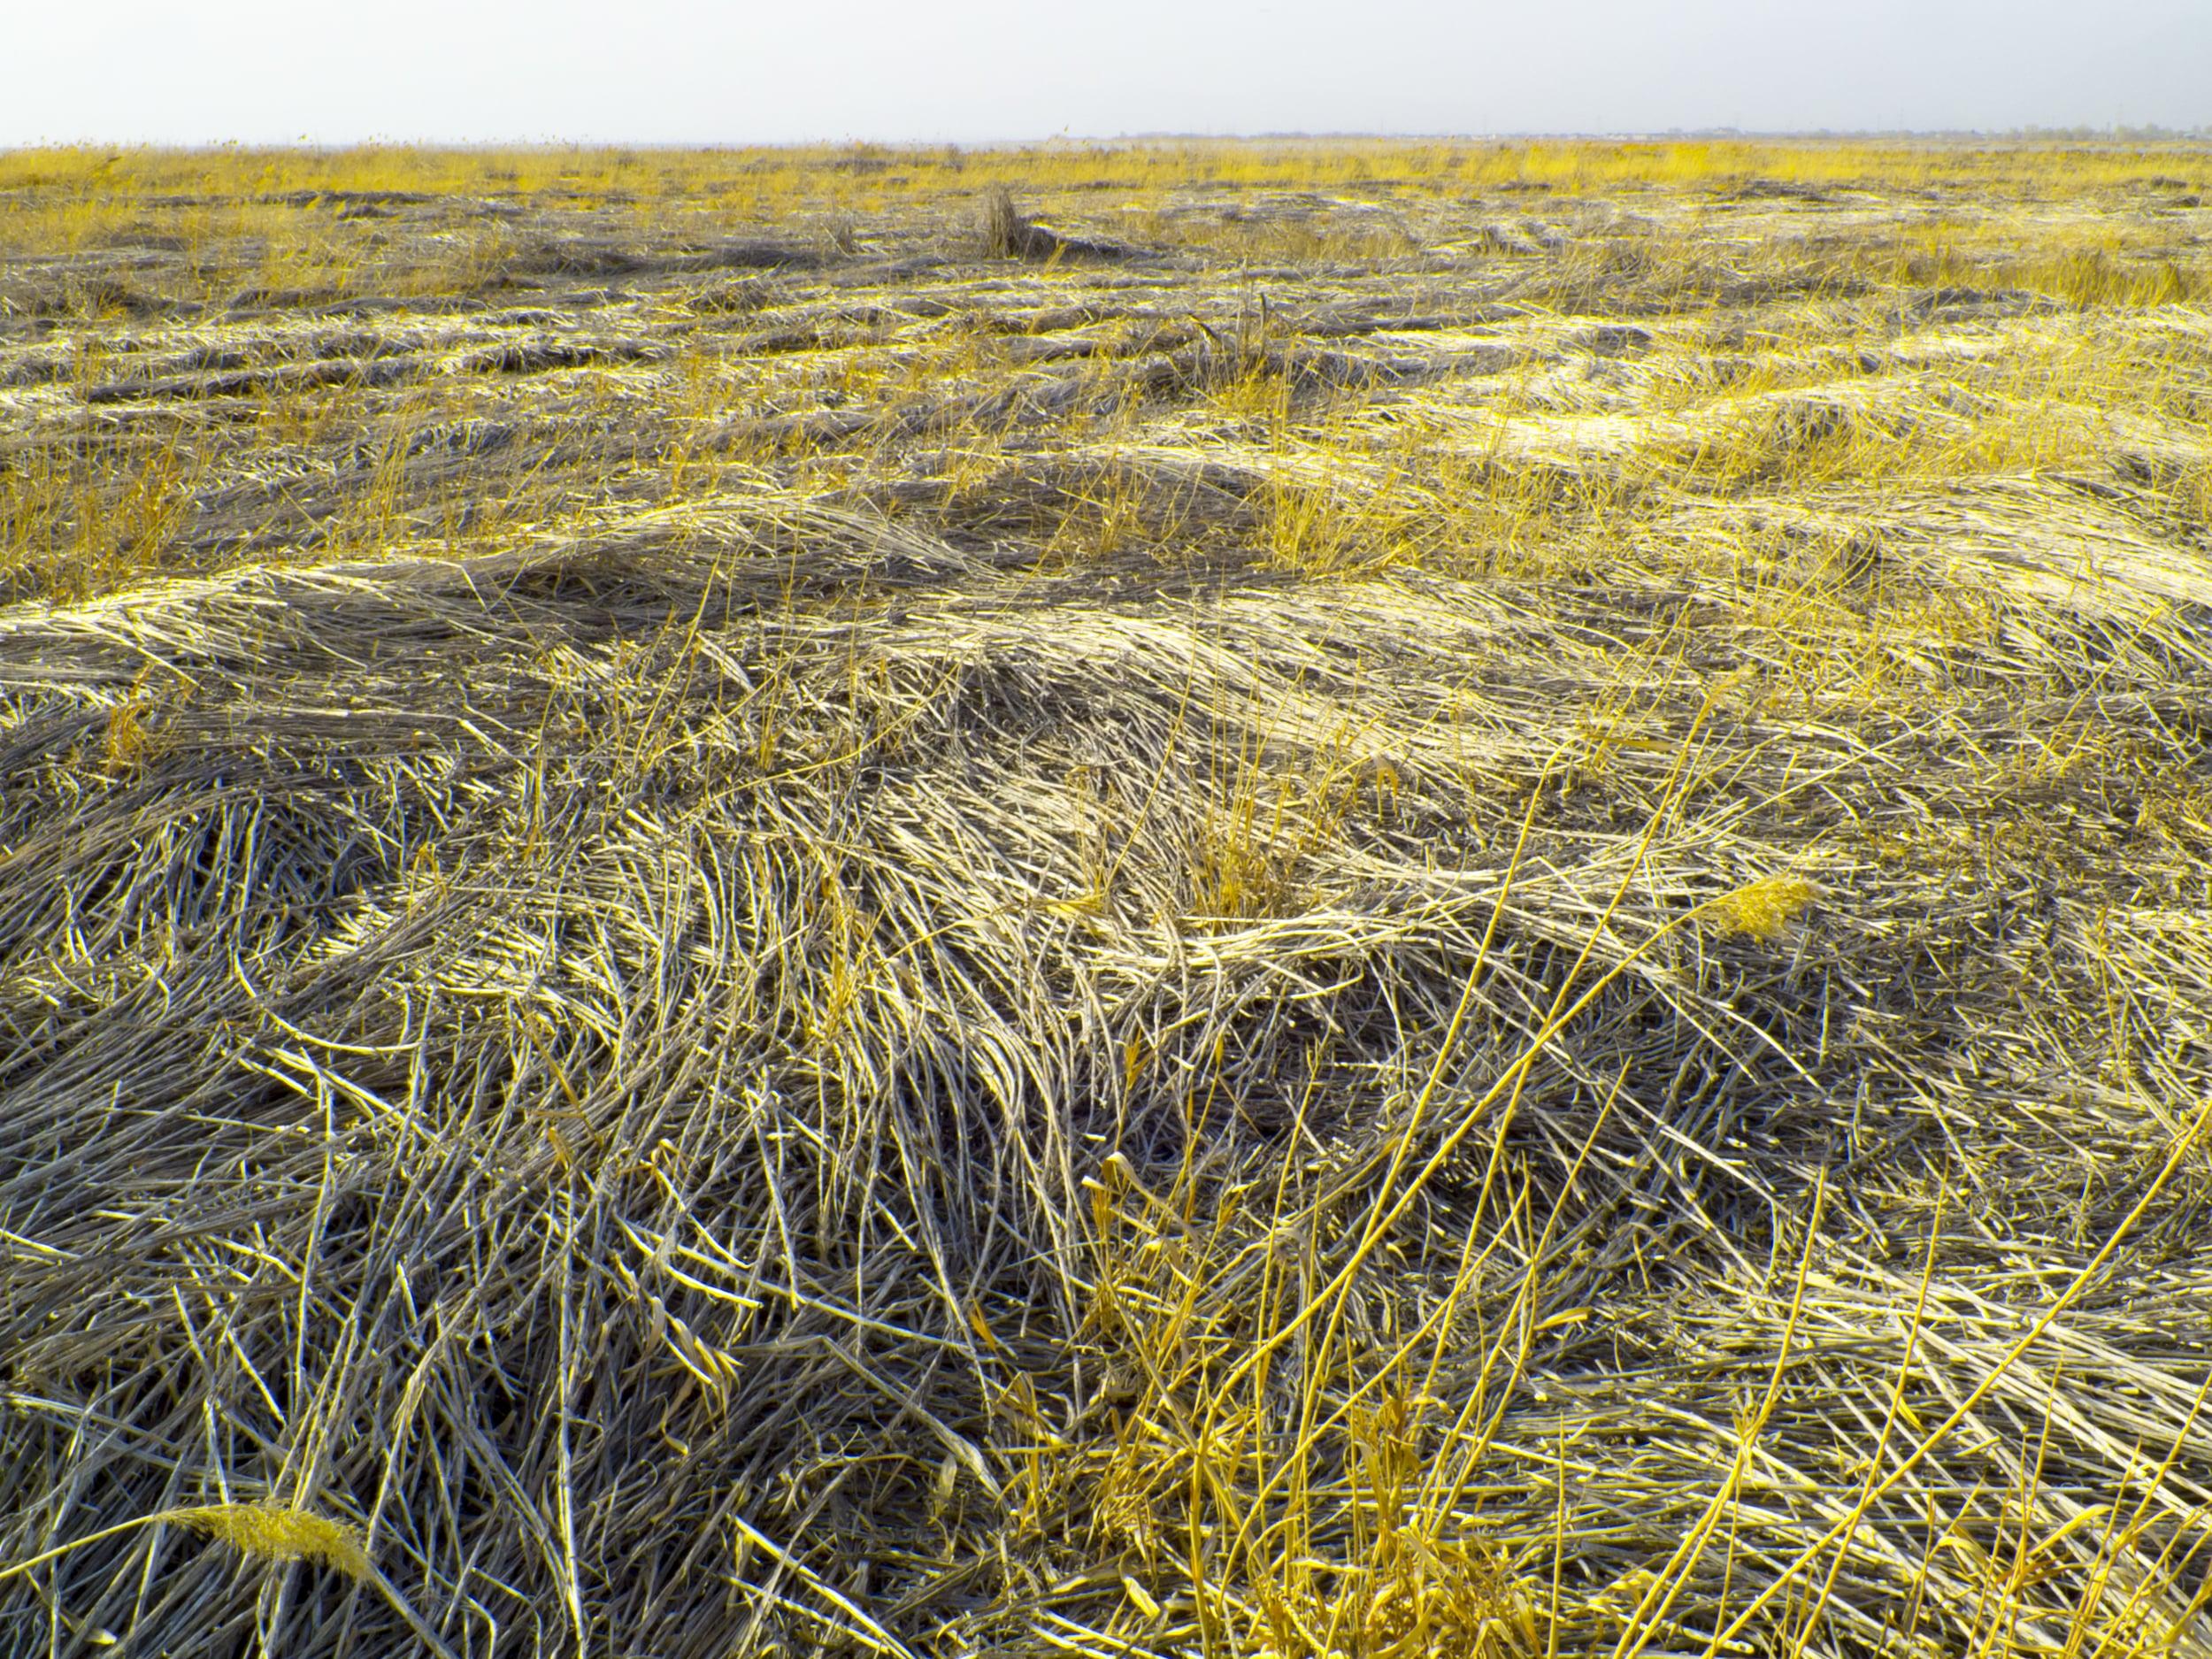 yellow weeds.jpg